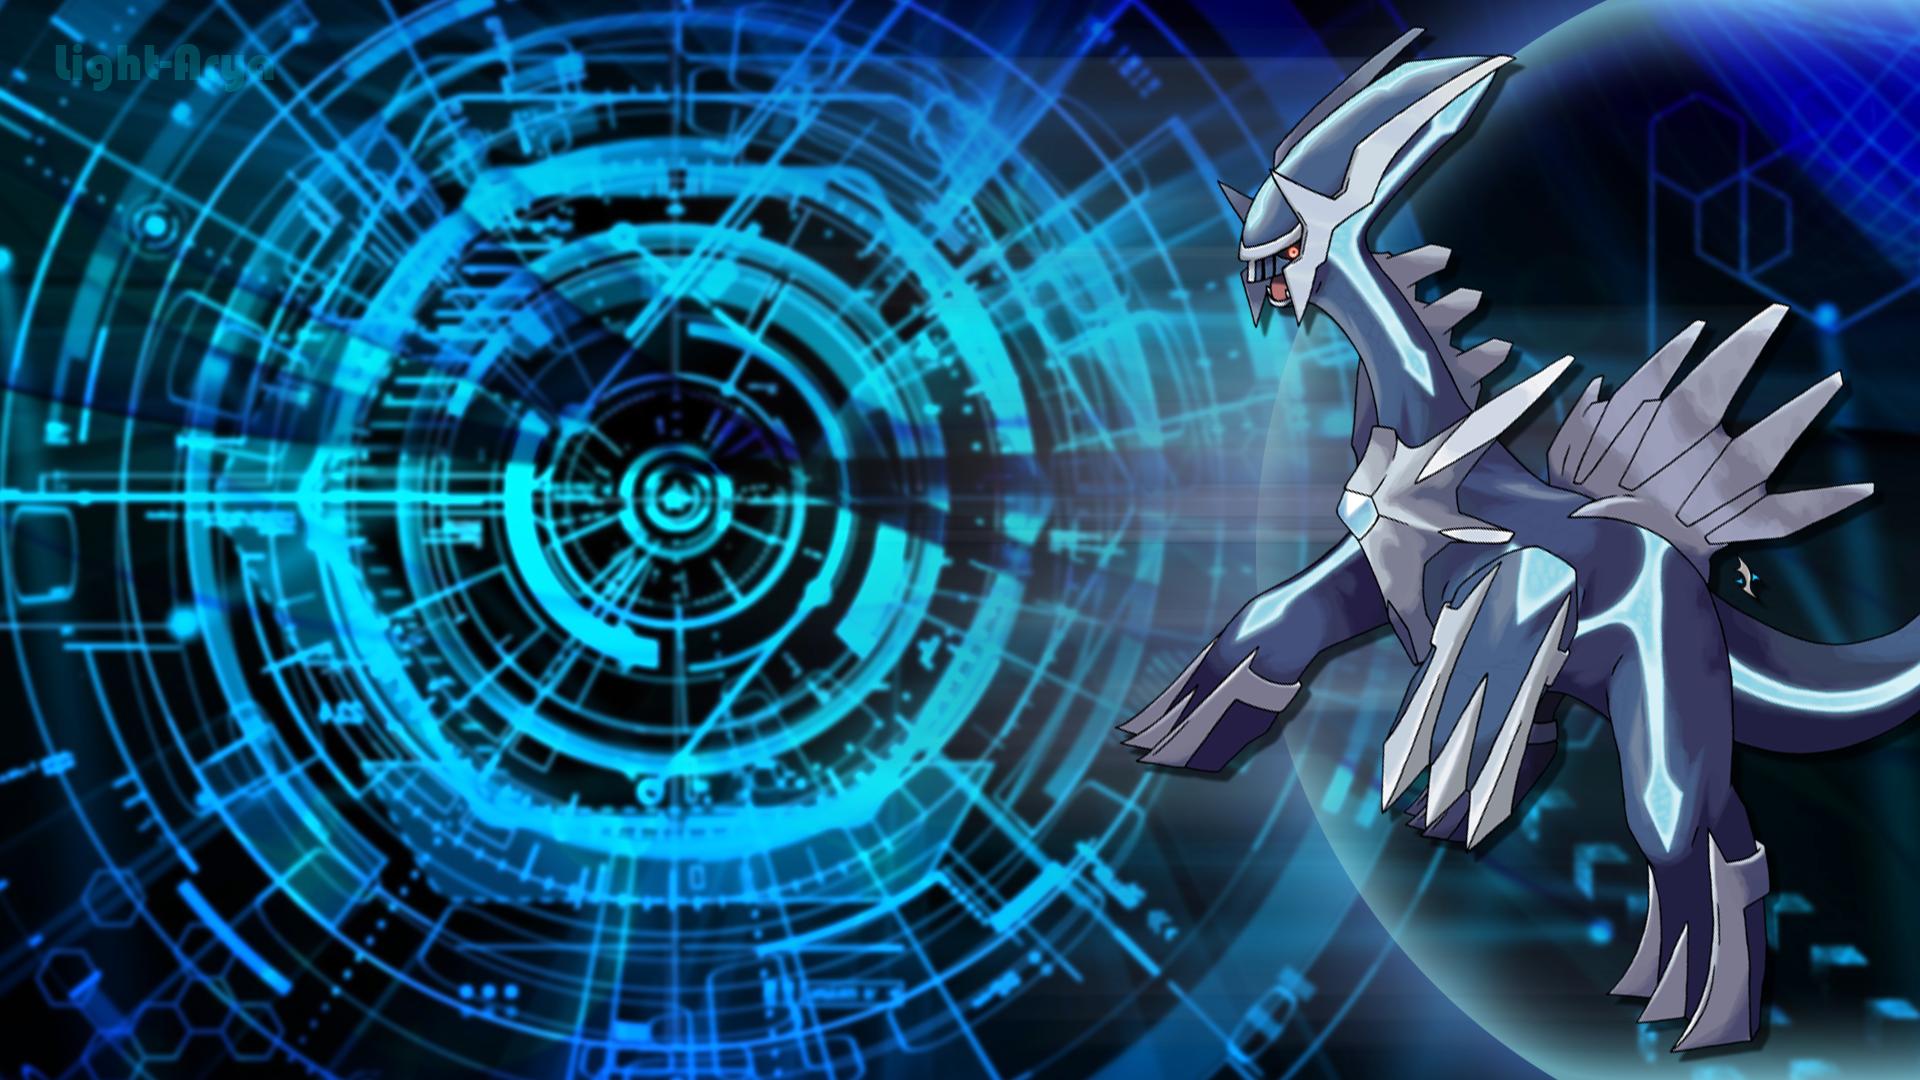 Dialga Pokemon Diamond By Light Arya On Deviantart